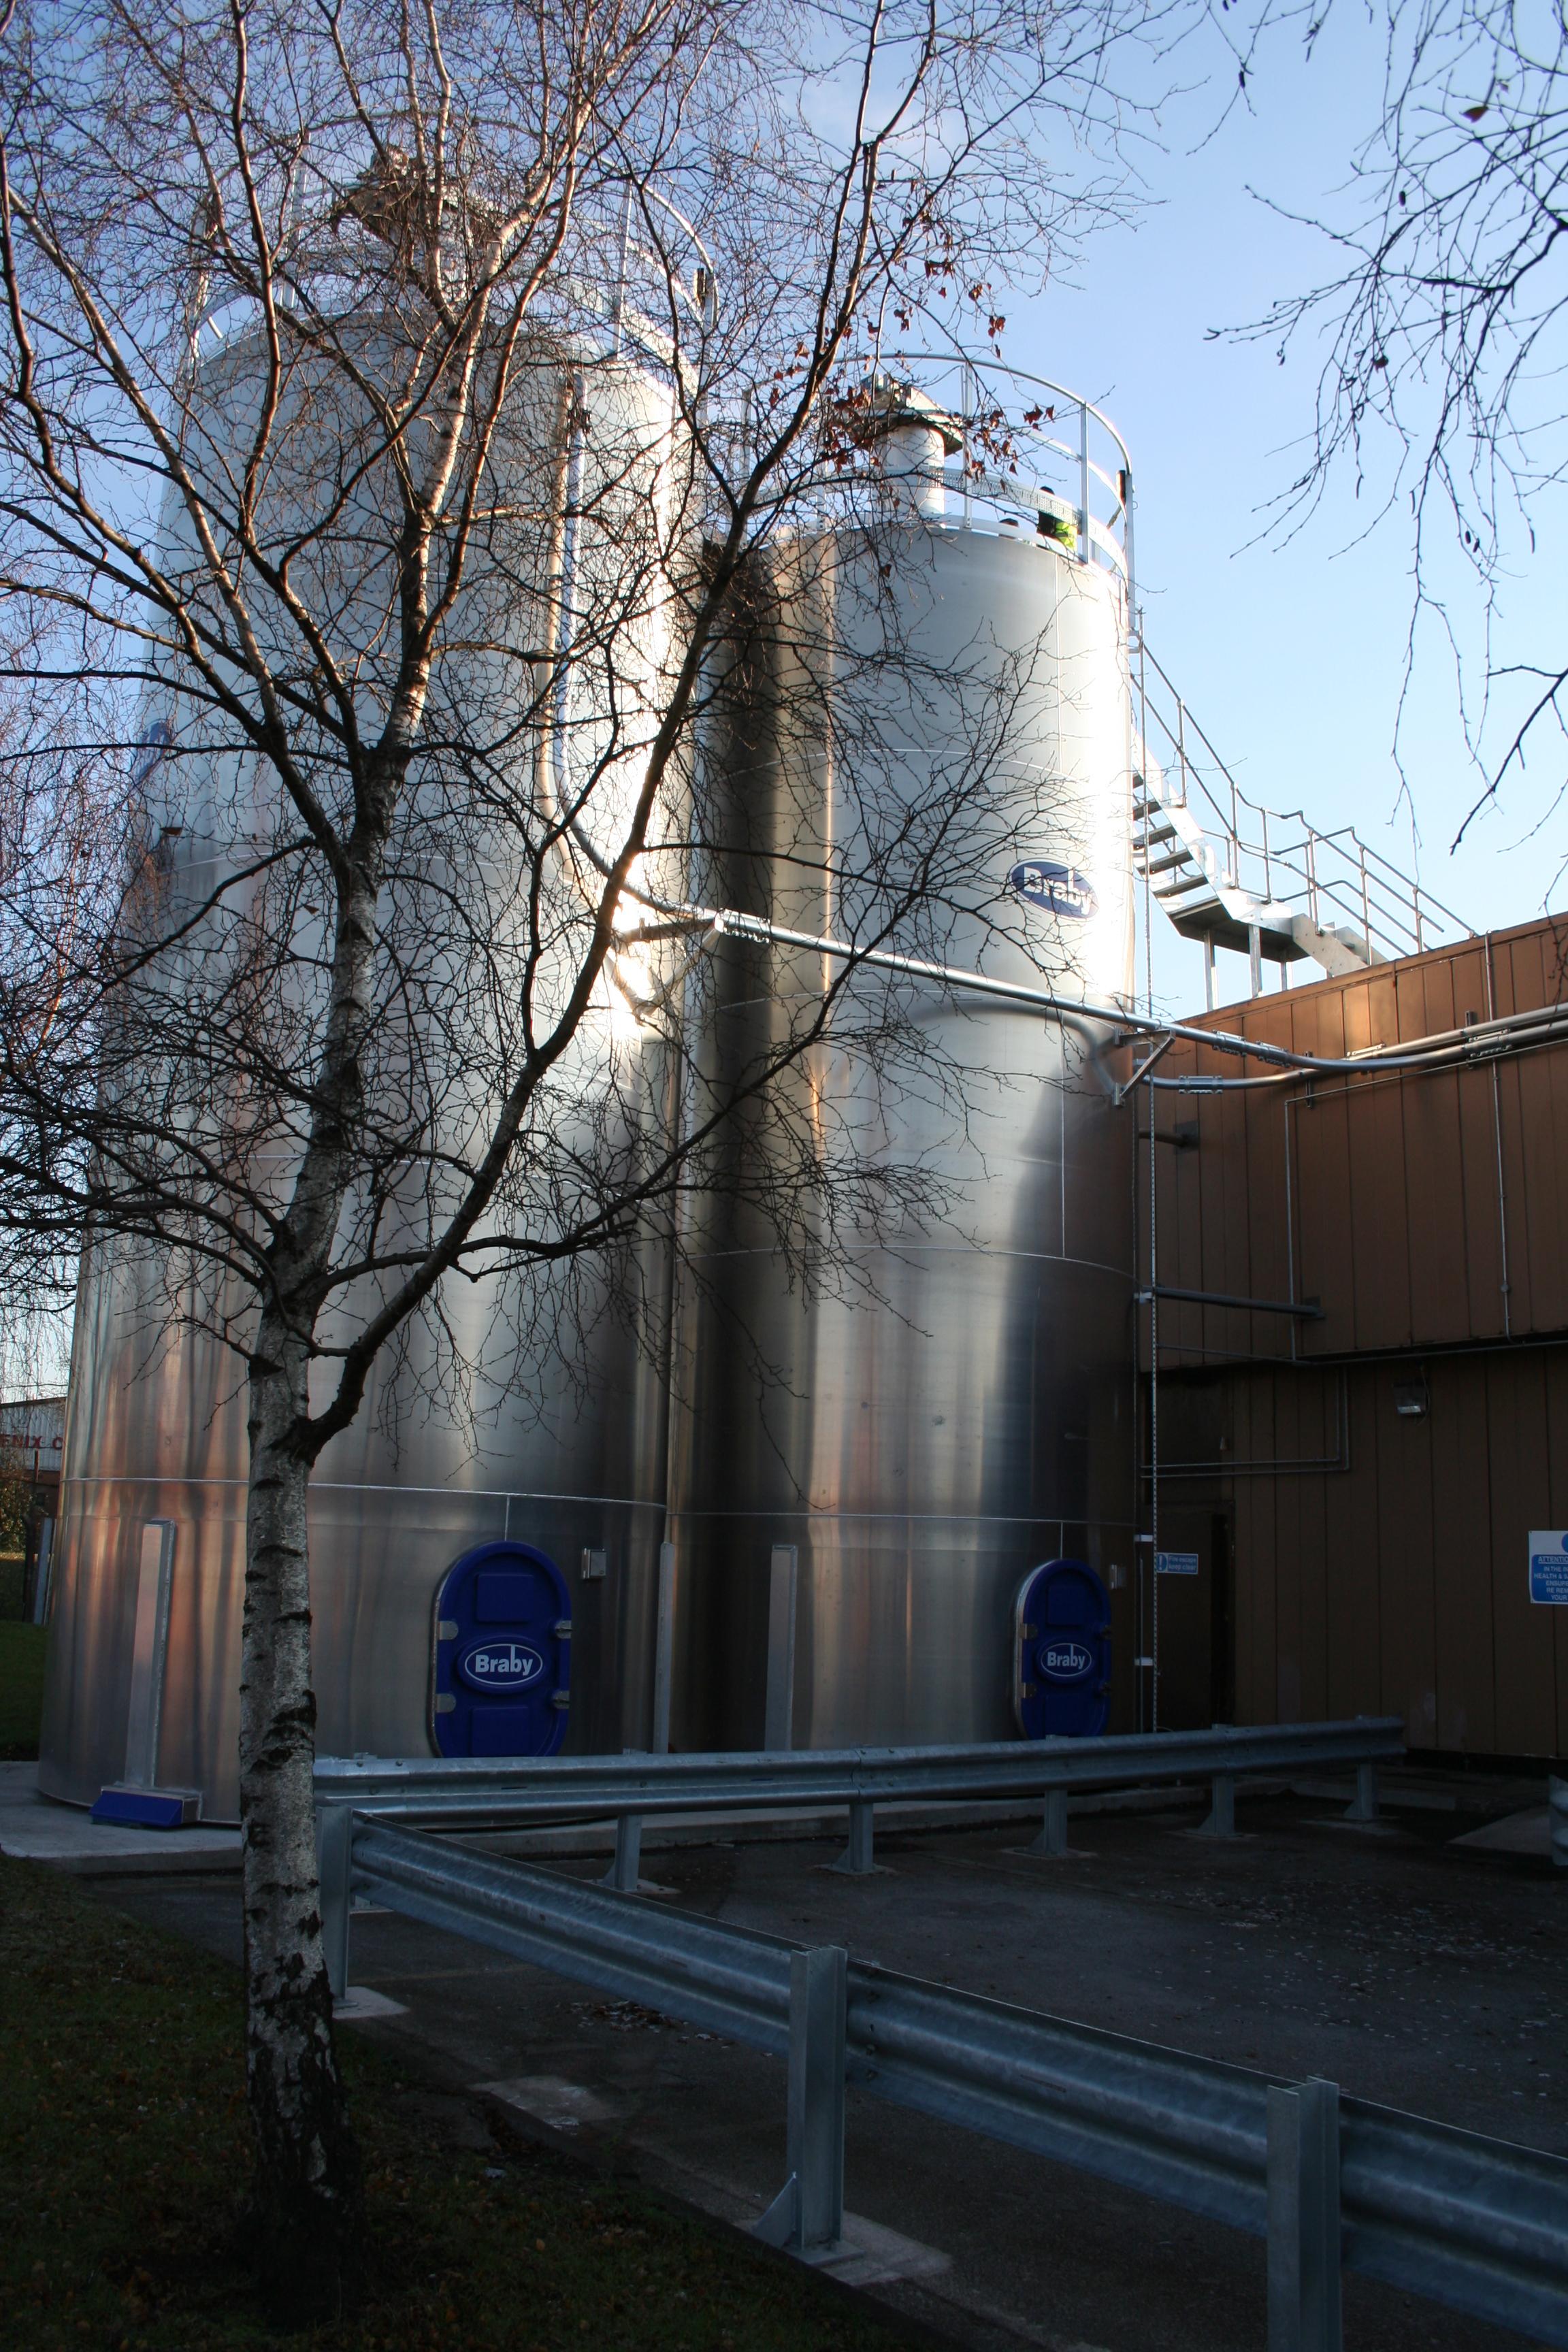 Pizza factory silos.jpg